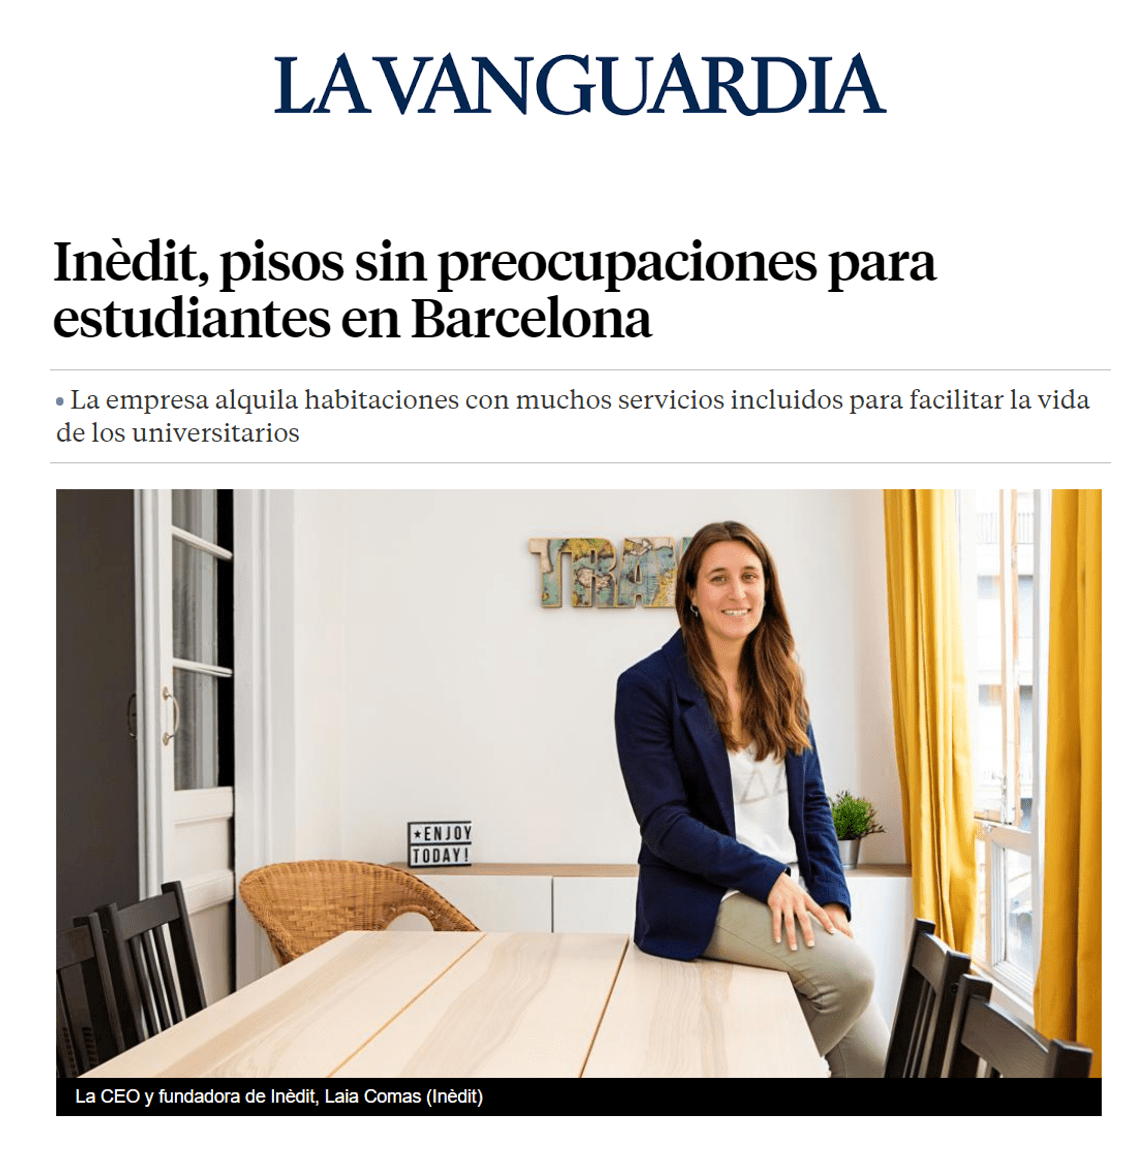 https://whiterabbit.es/wp-content/uploads/2018/08/Inedit_La-Vanguardia.png